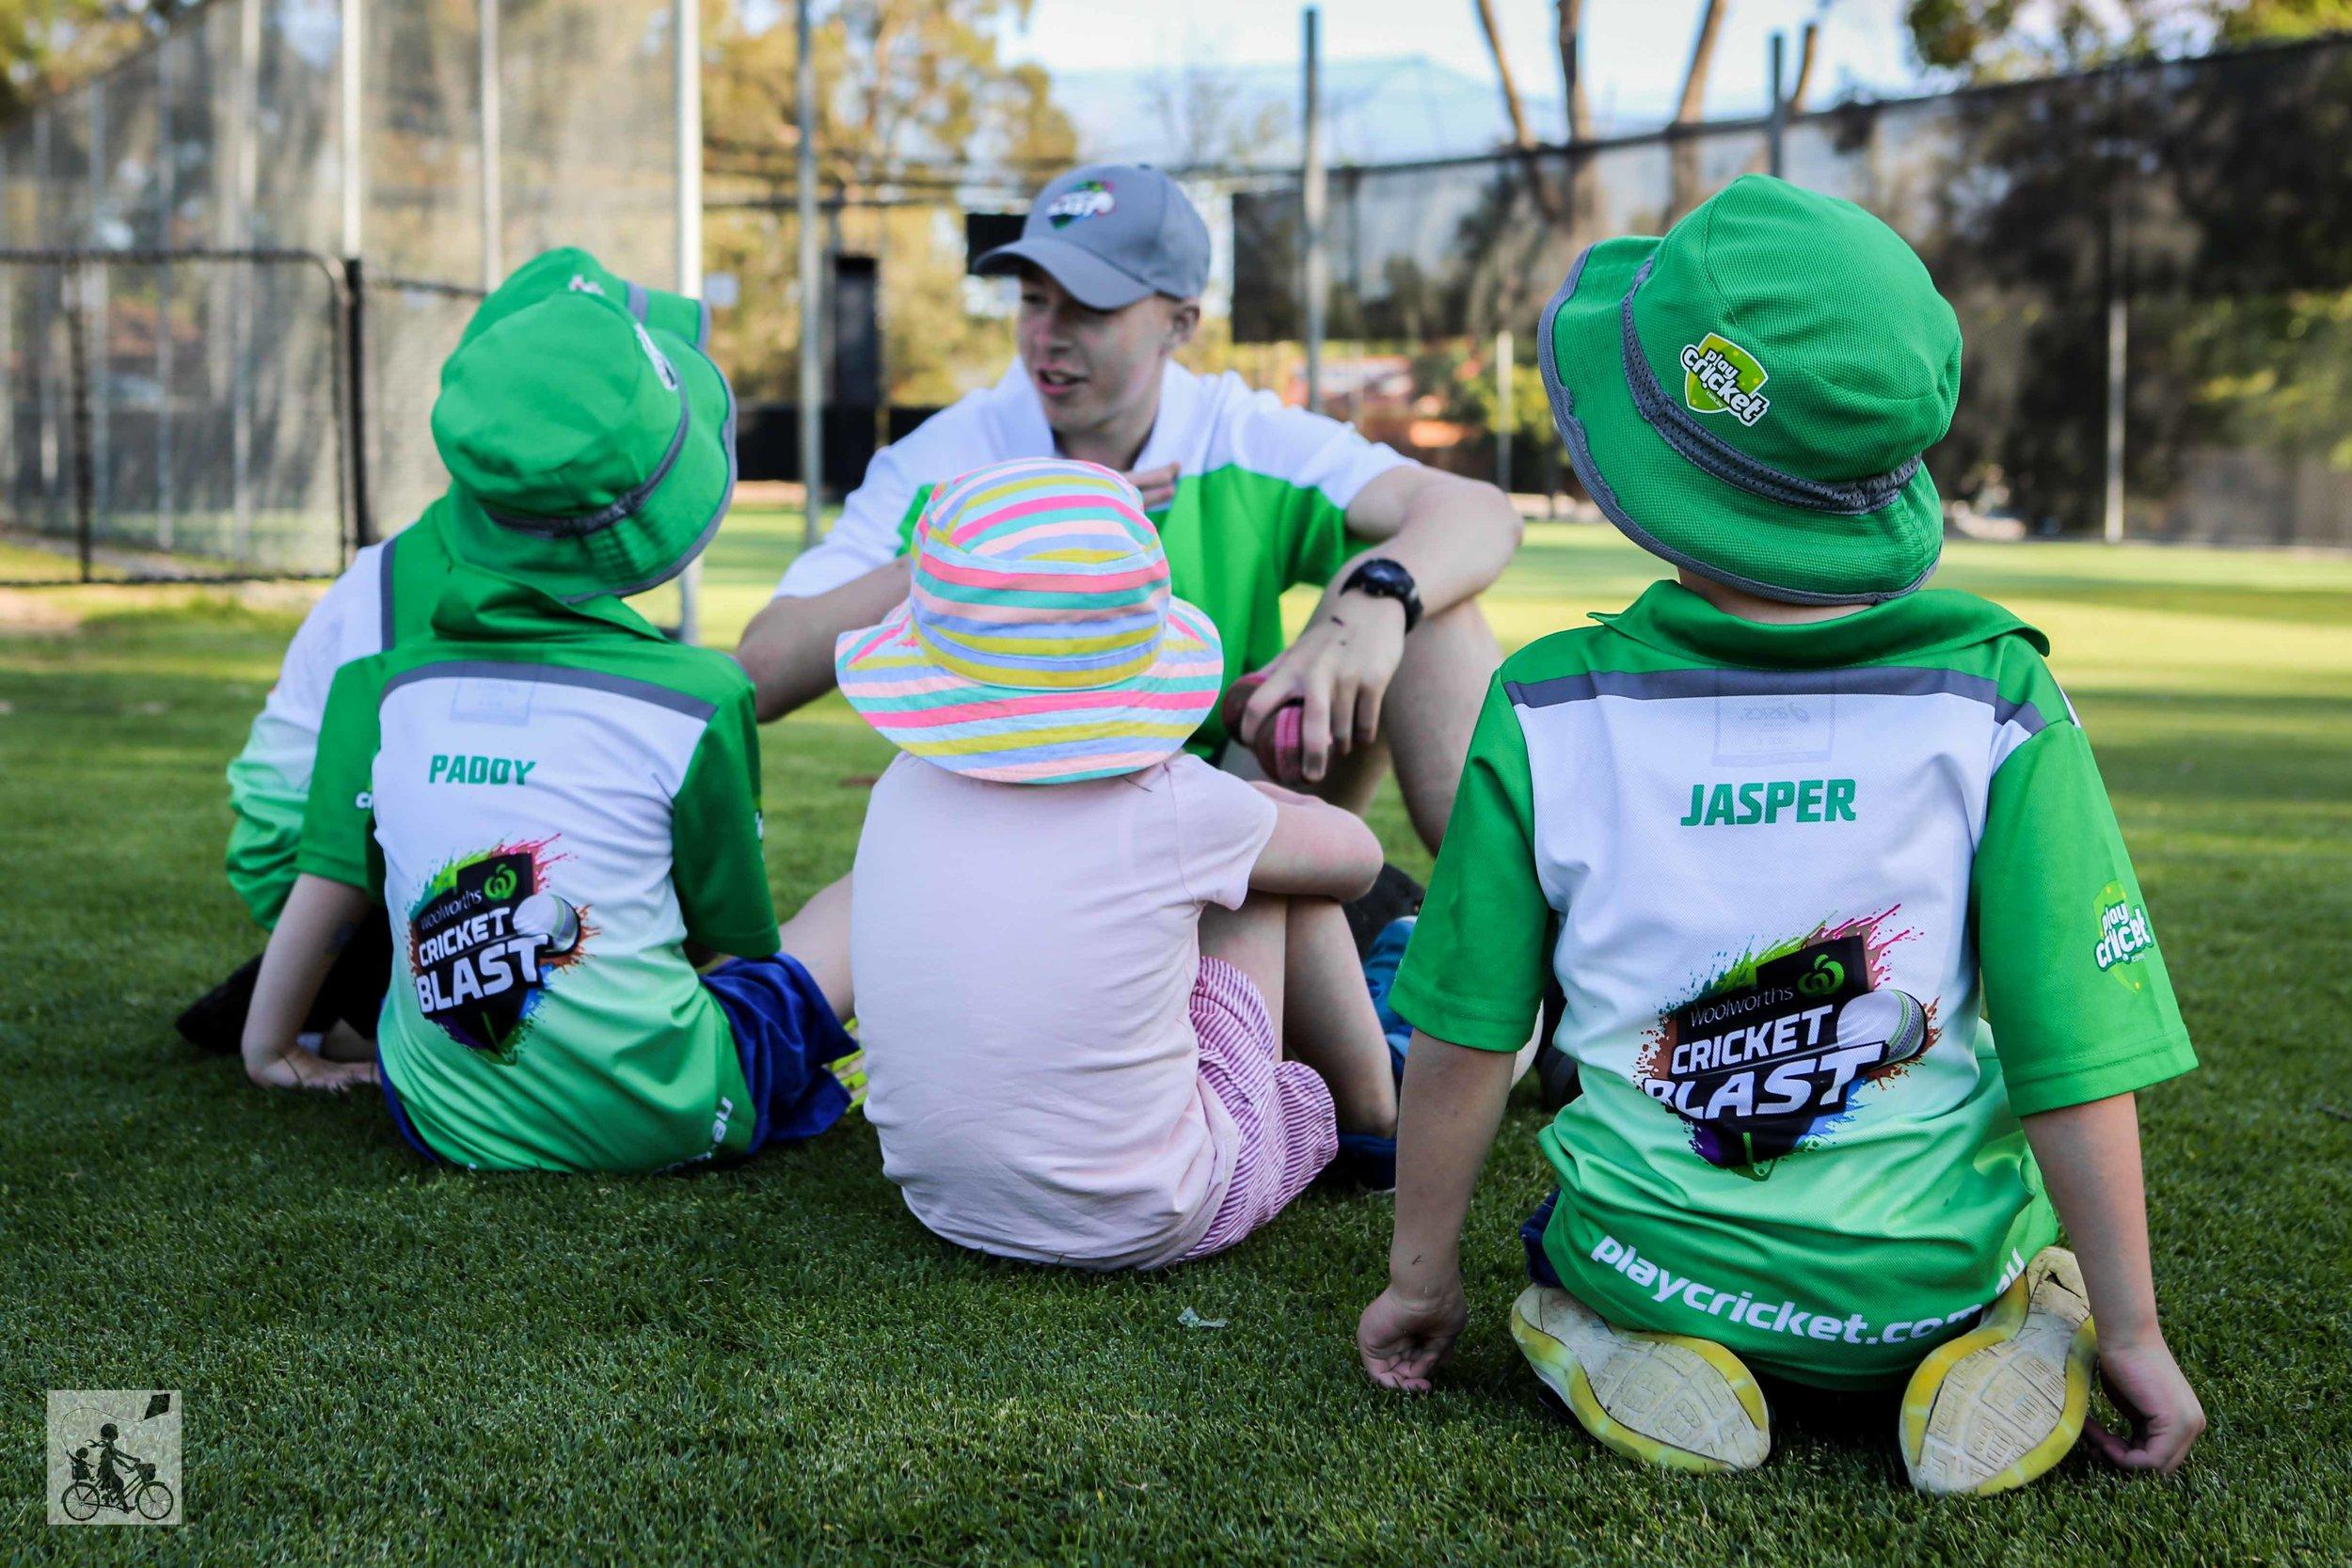 Woolworths Blast Cricket - Mamma Knows Melbourne (16 of 45).jpg